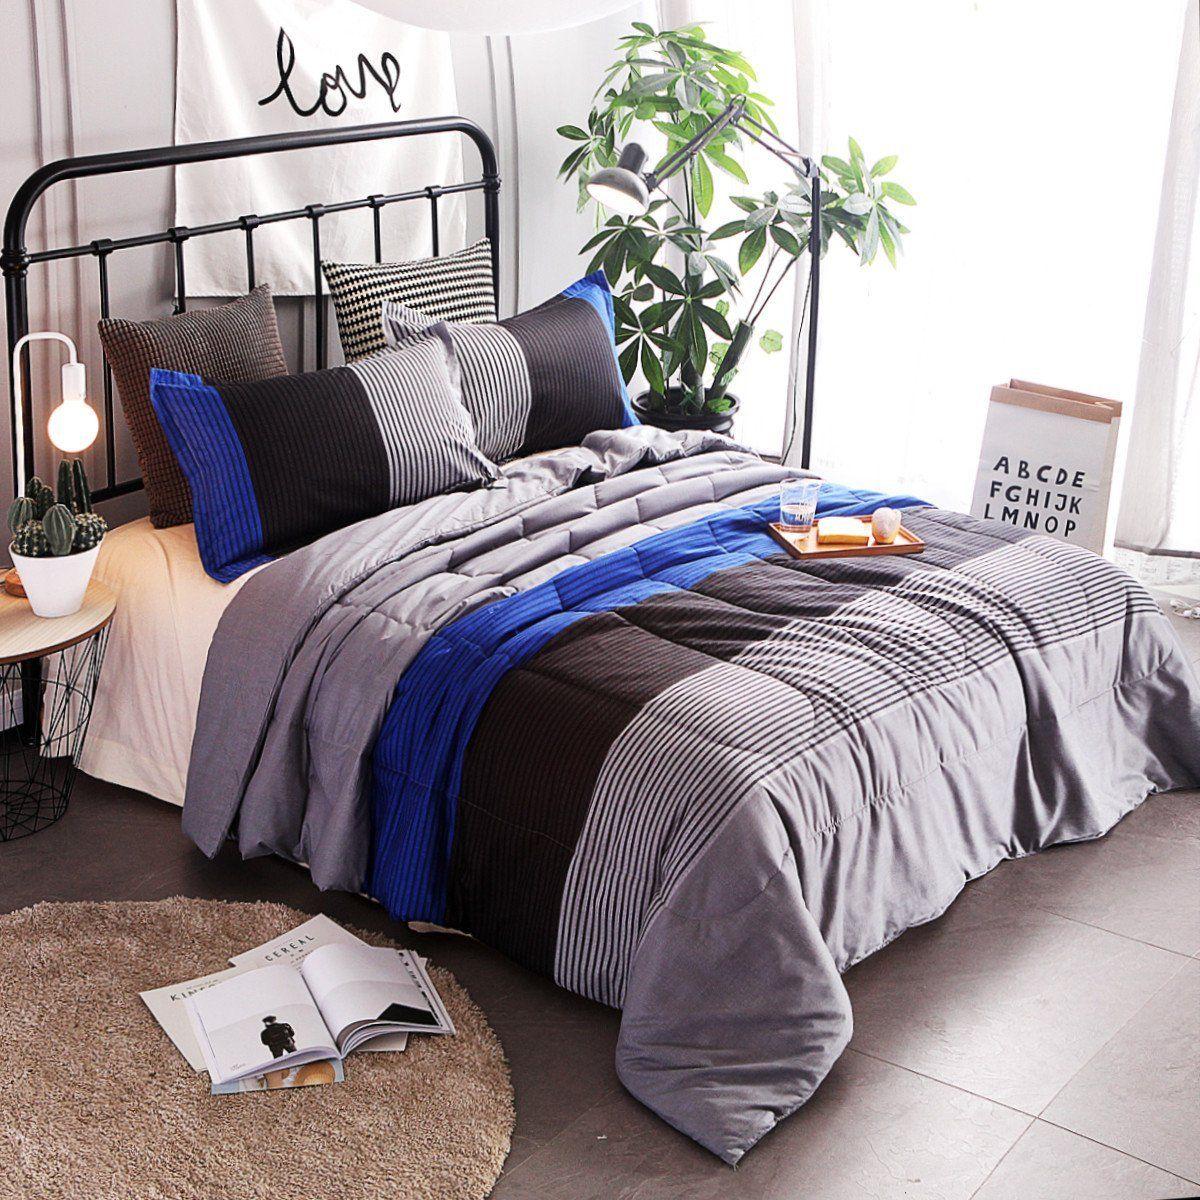 Bedspreads.Winlife 3 Piece Striped Quilt Set Boys Bedspreads Coverlet Sets Comforter Sets Queen